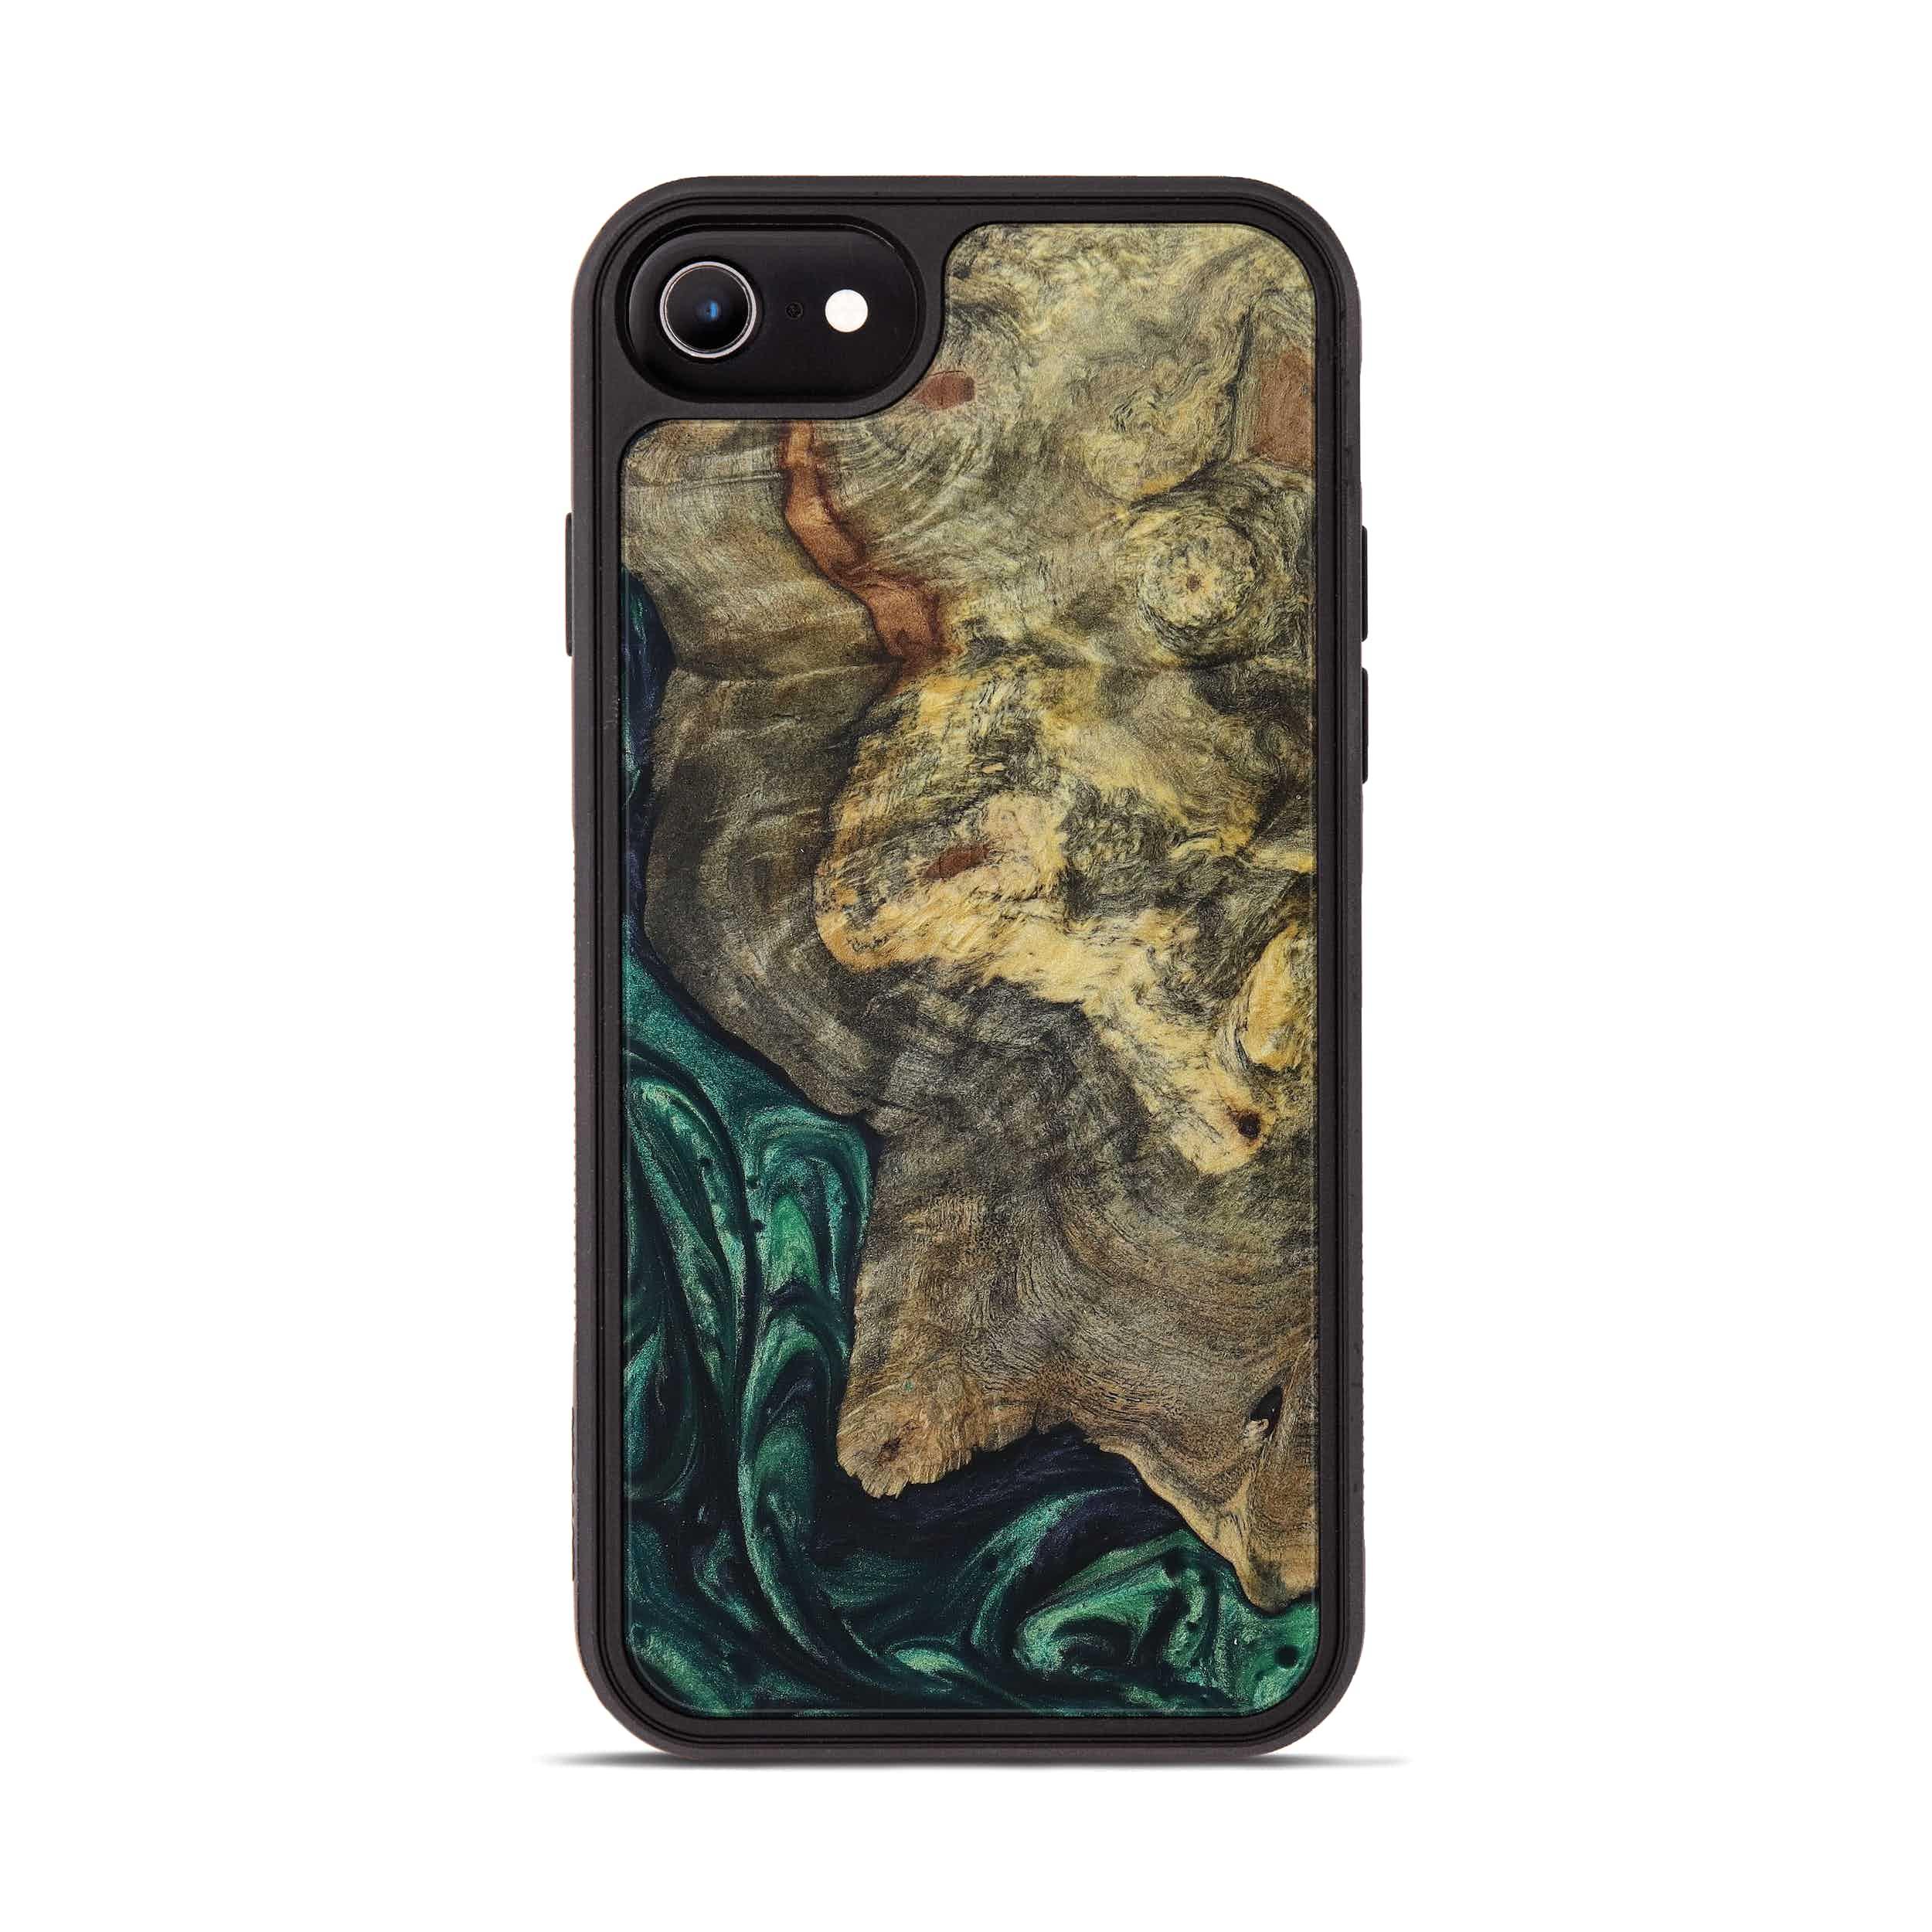 iPhone 8 Wood+Resin Phone Case - Clay (Dark Green, 394659)